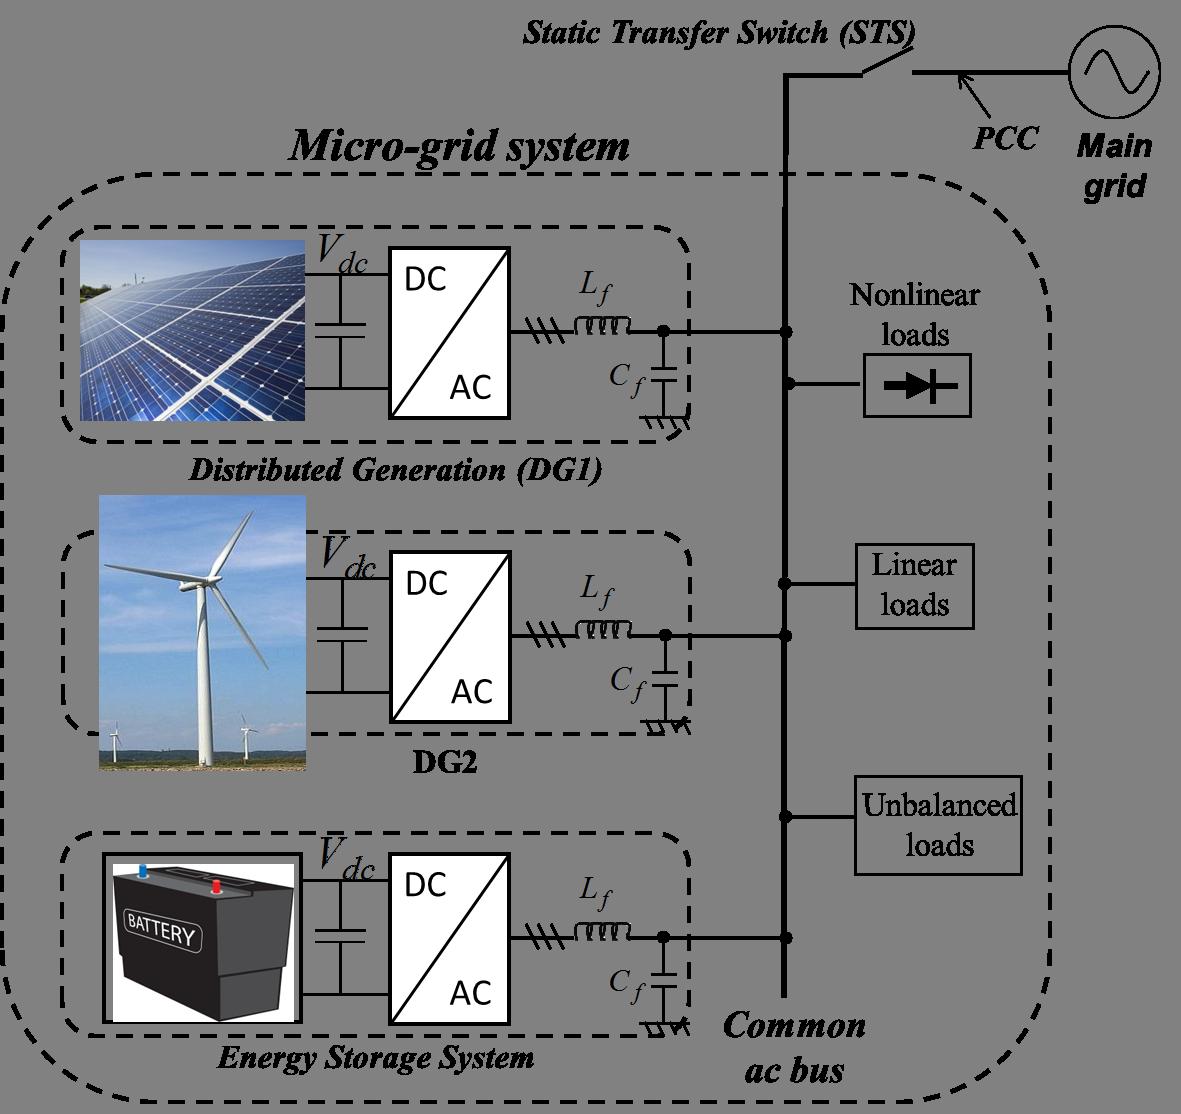 Microgrid control system